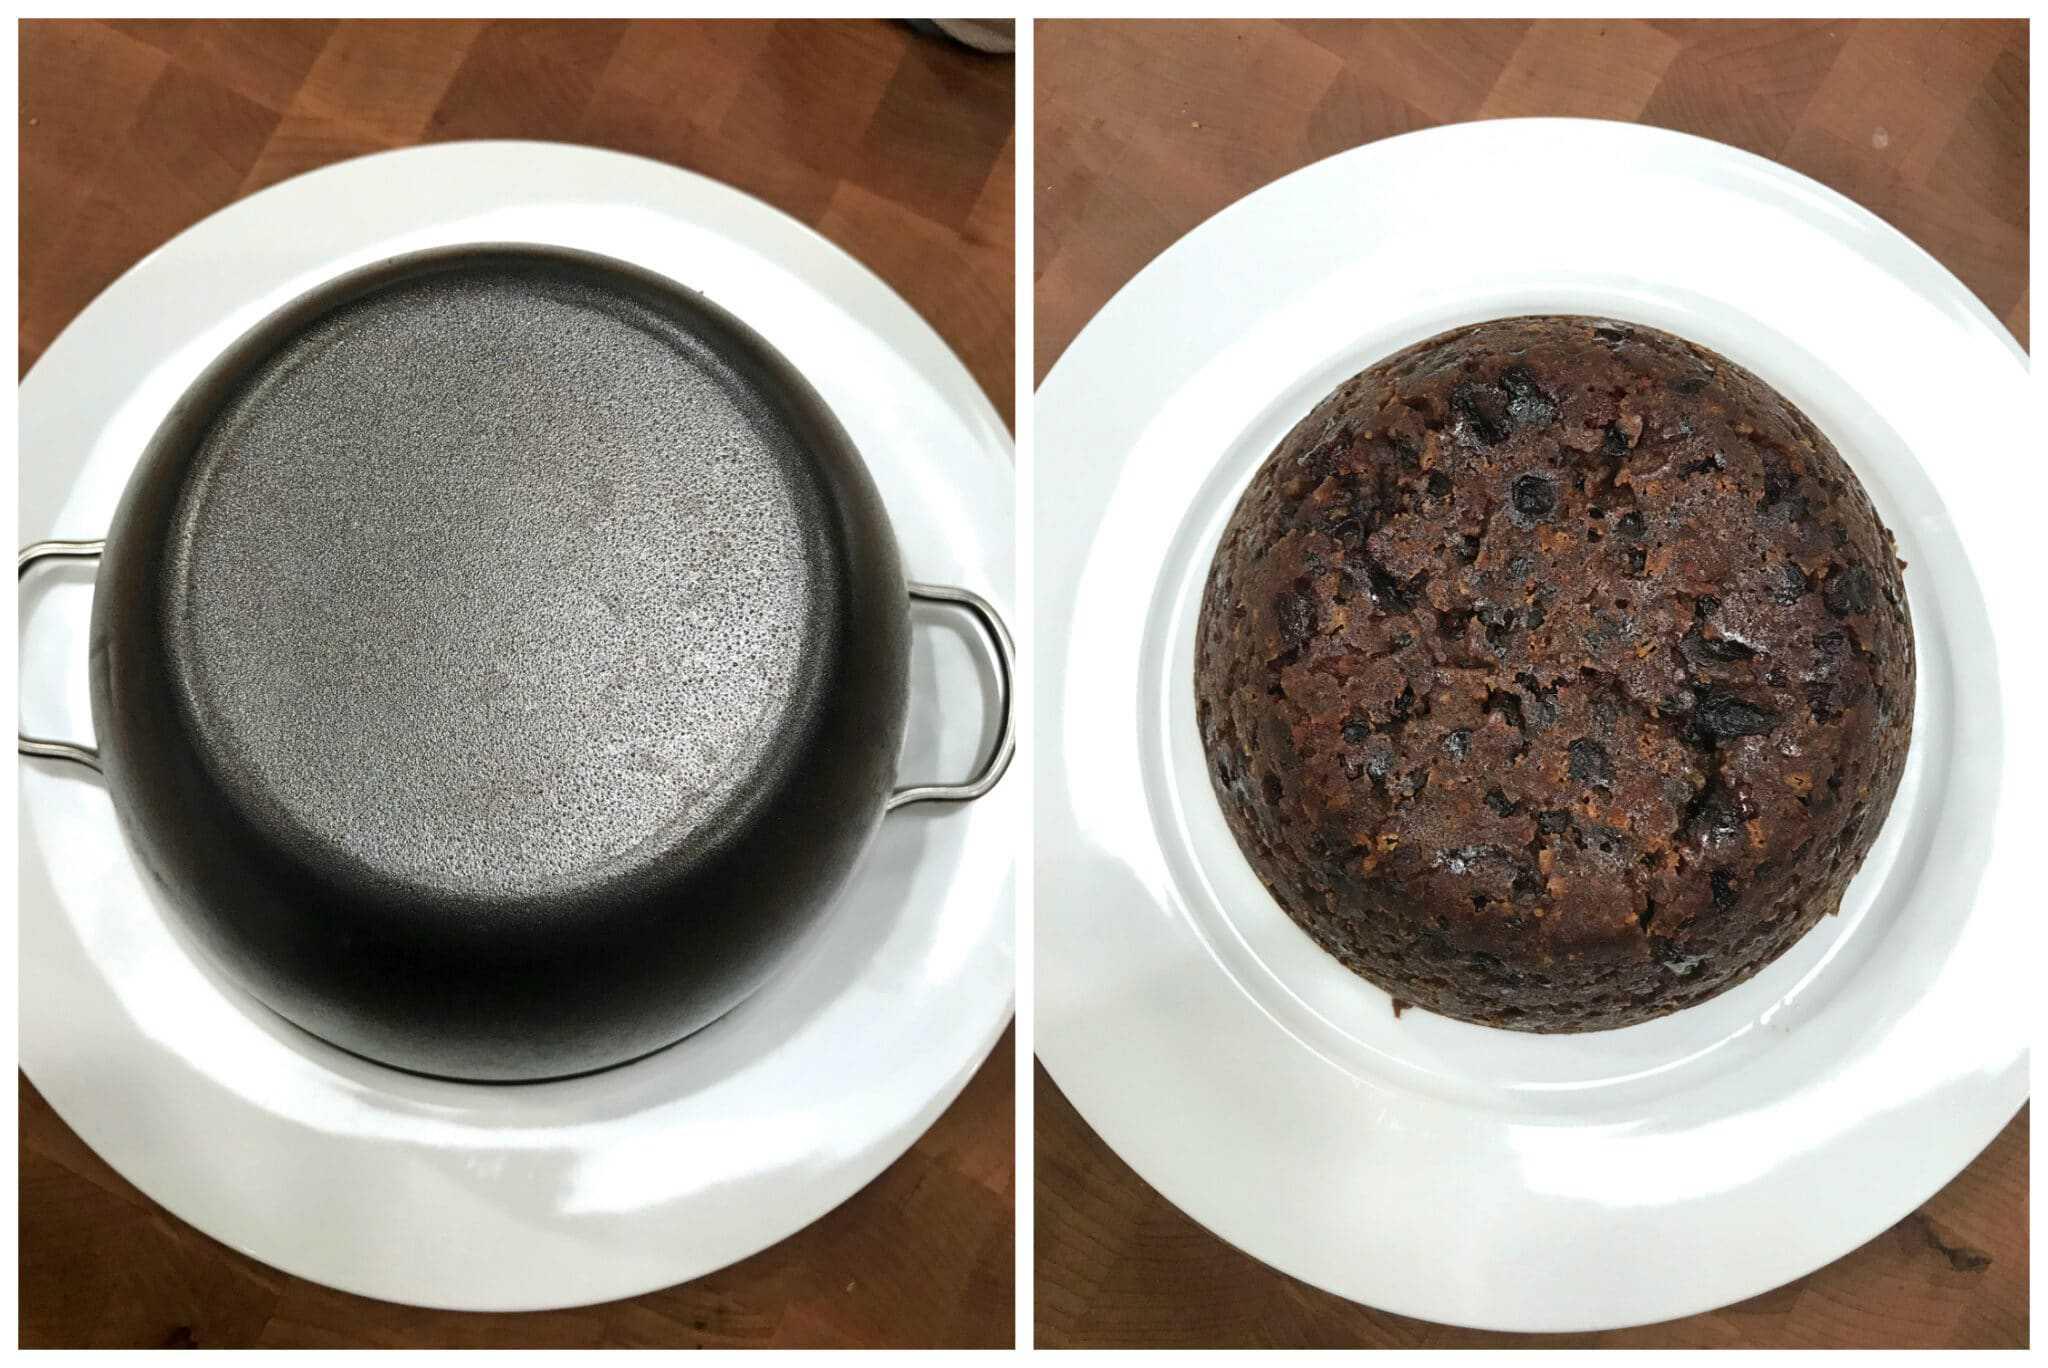 invert mold onto plate